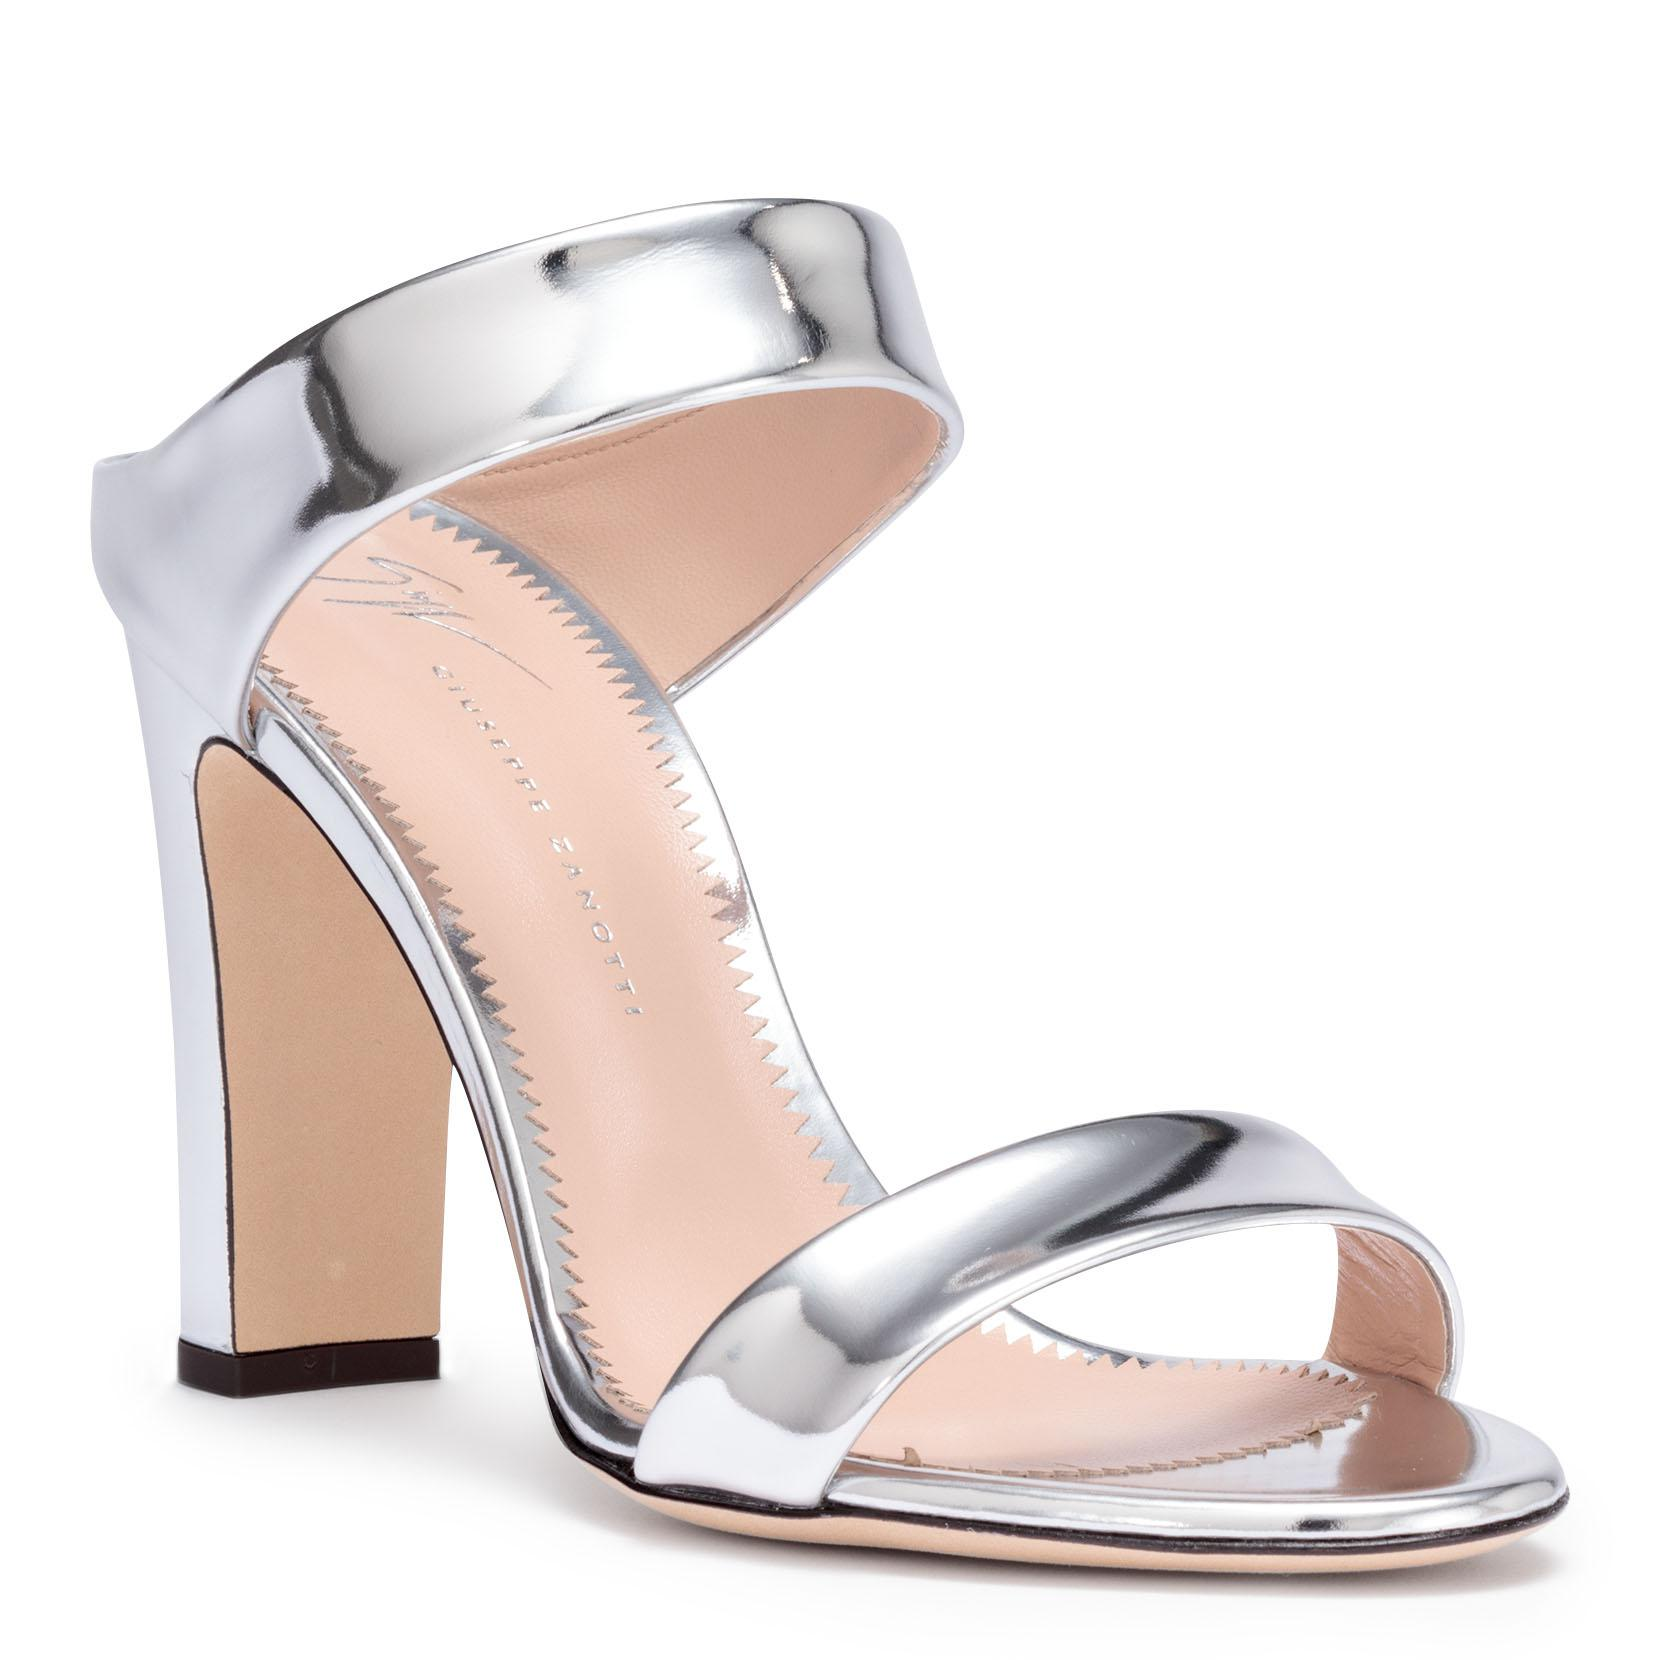 free shipping store Giuseppe Zanotti Metallic silver leather block heel sandals brand new unisex cheap online zsb54ZAPf